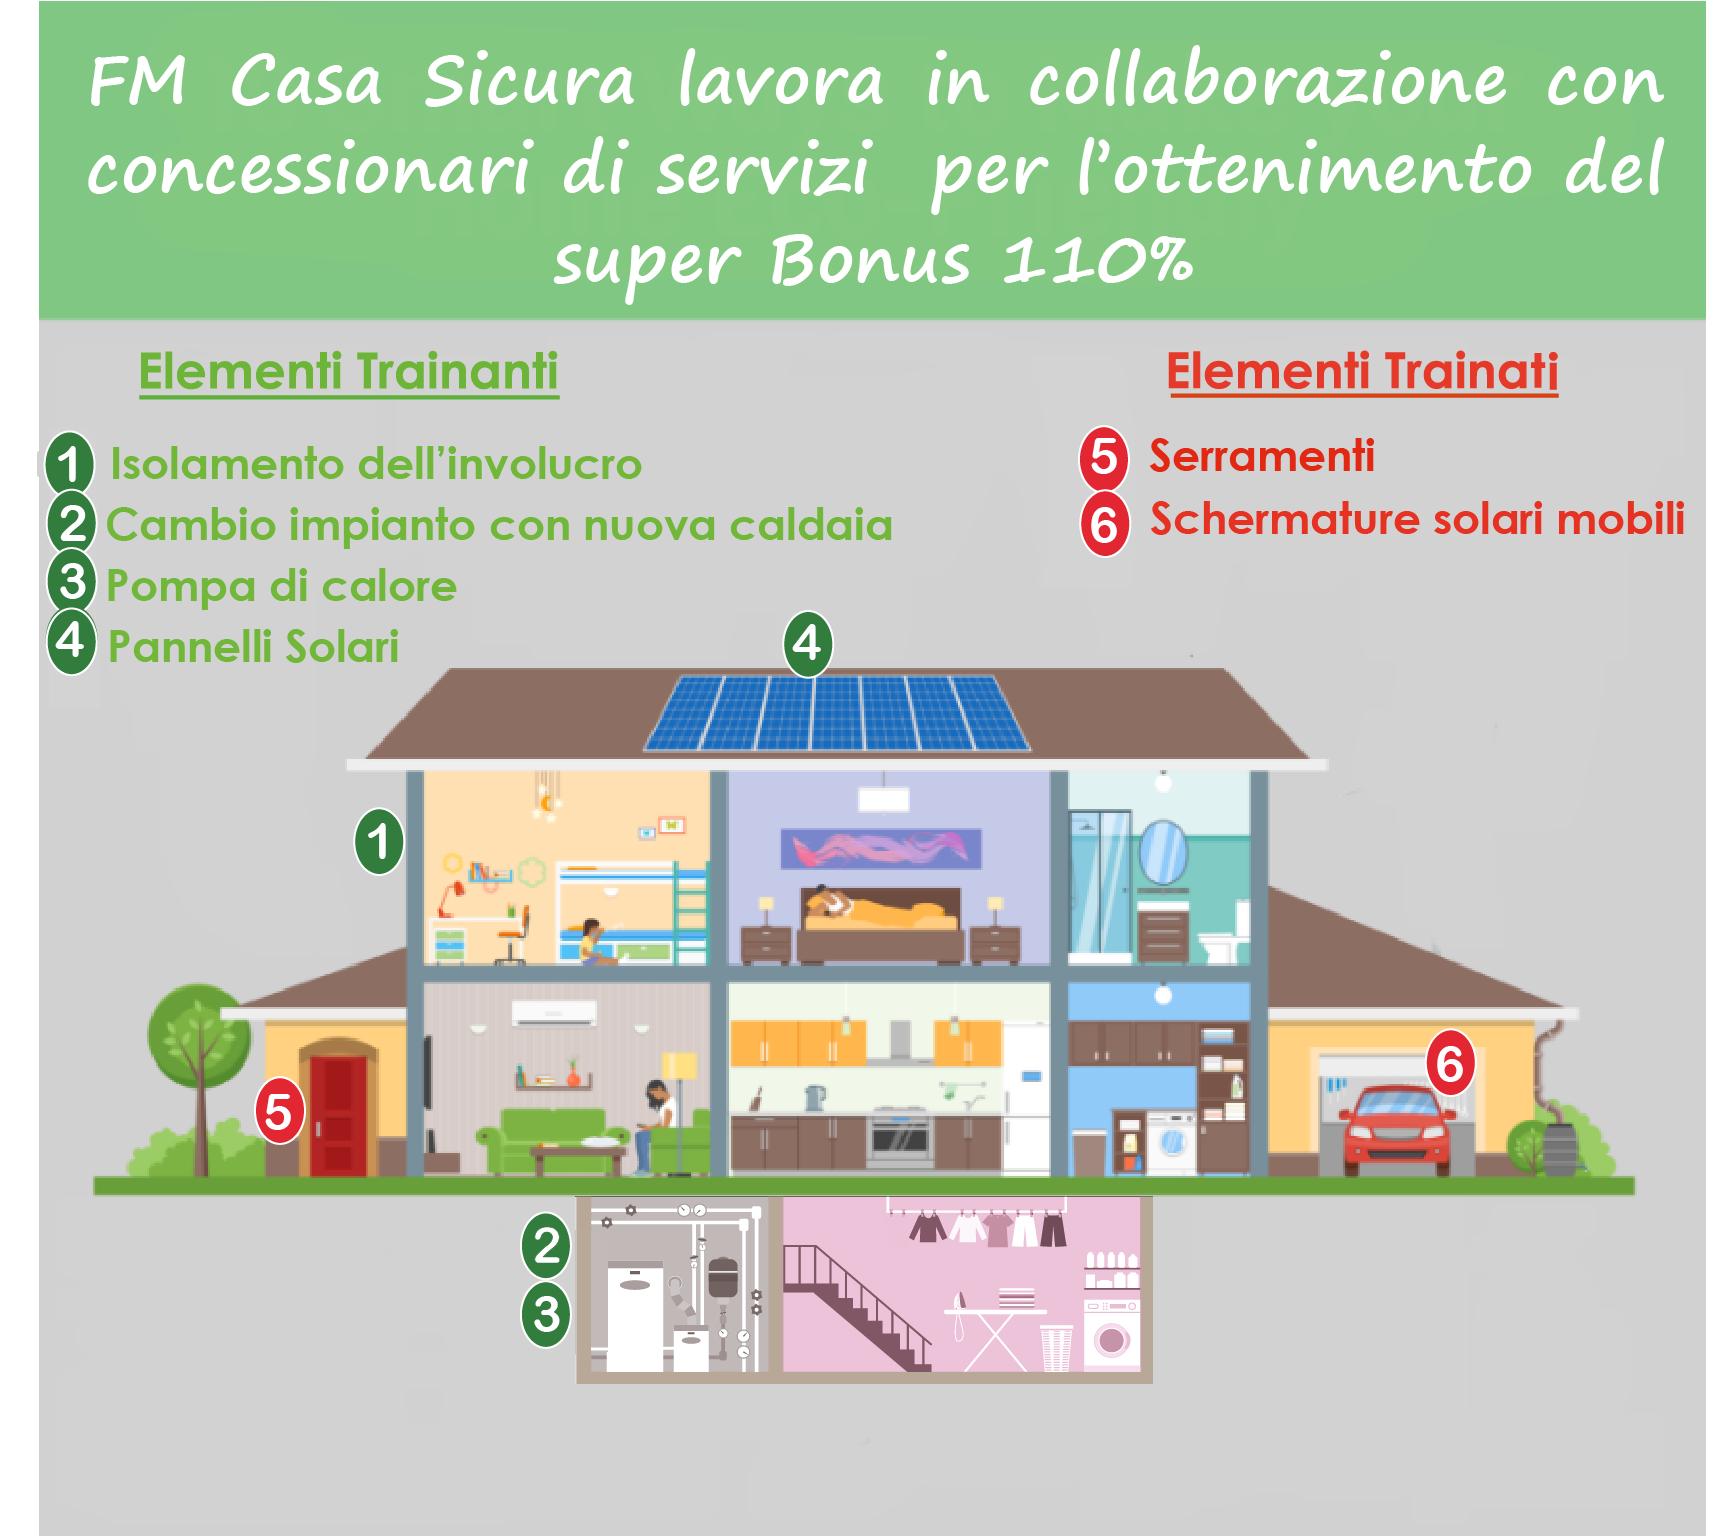 superbonus 110 decreto rilancio, Super Bonus 110% Decreto Rilancio Venezia, FM Casasicura, FM Casasicura